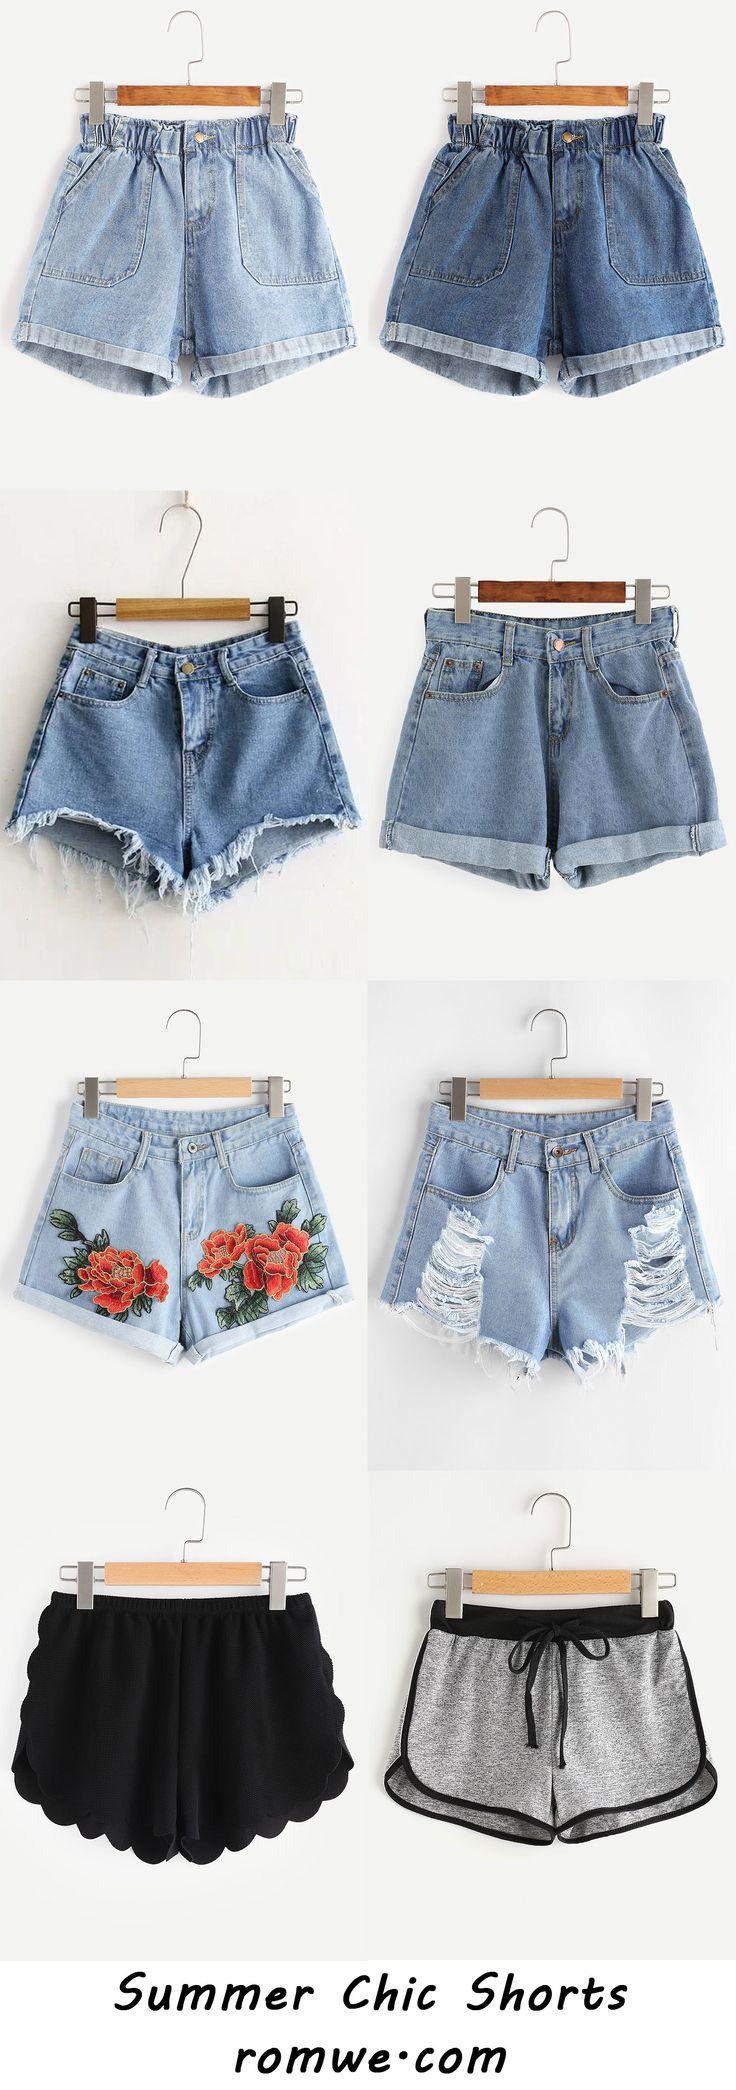 summer chic shorts 2017 - romwe.com